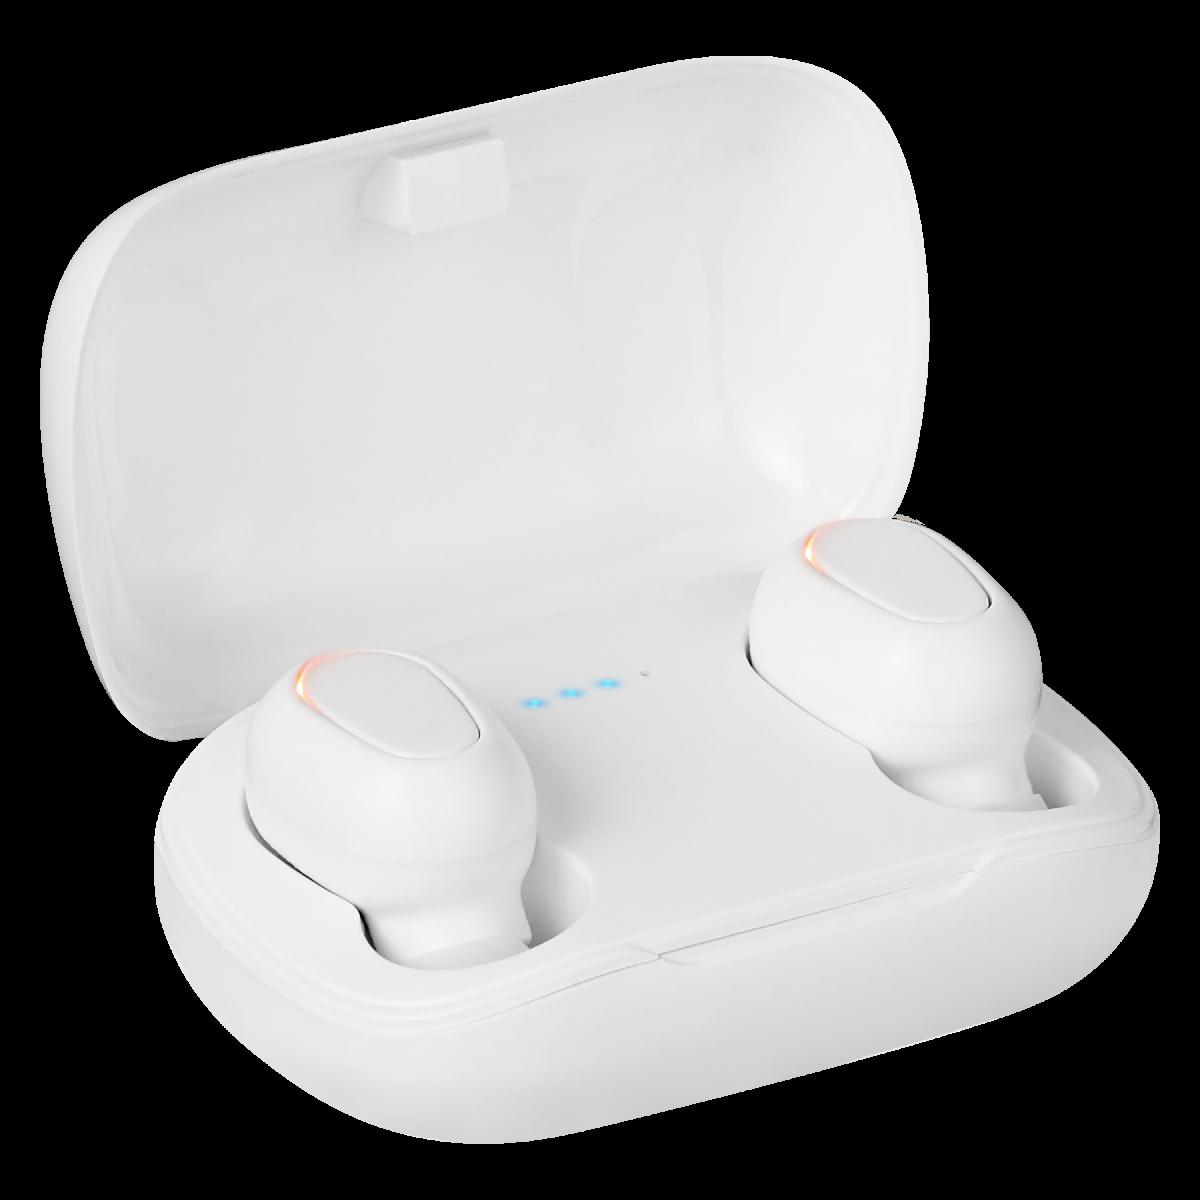 Premio V5 Series Bluetooth True Wireless Earphones With Charging Case